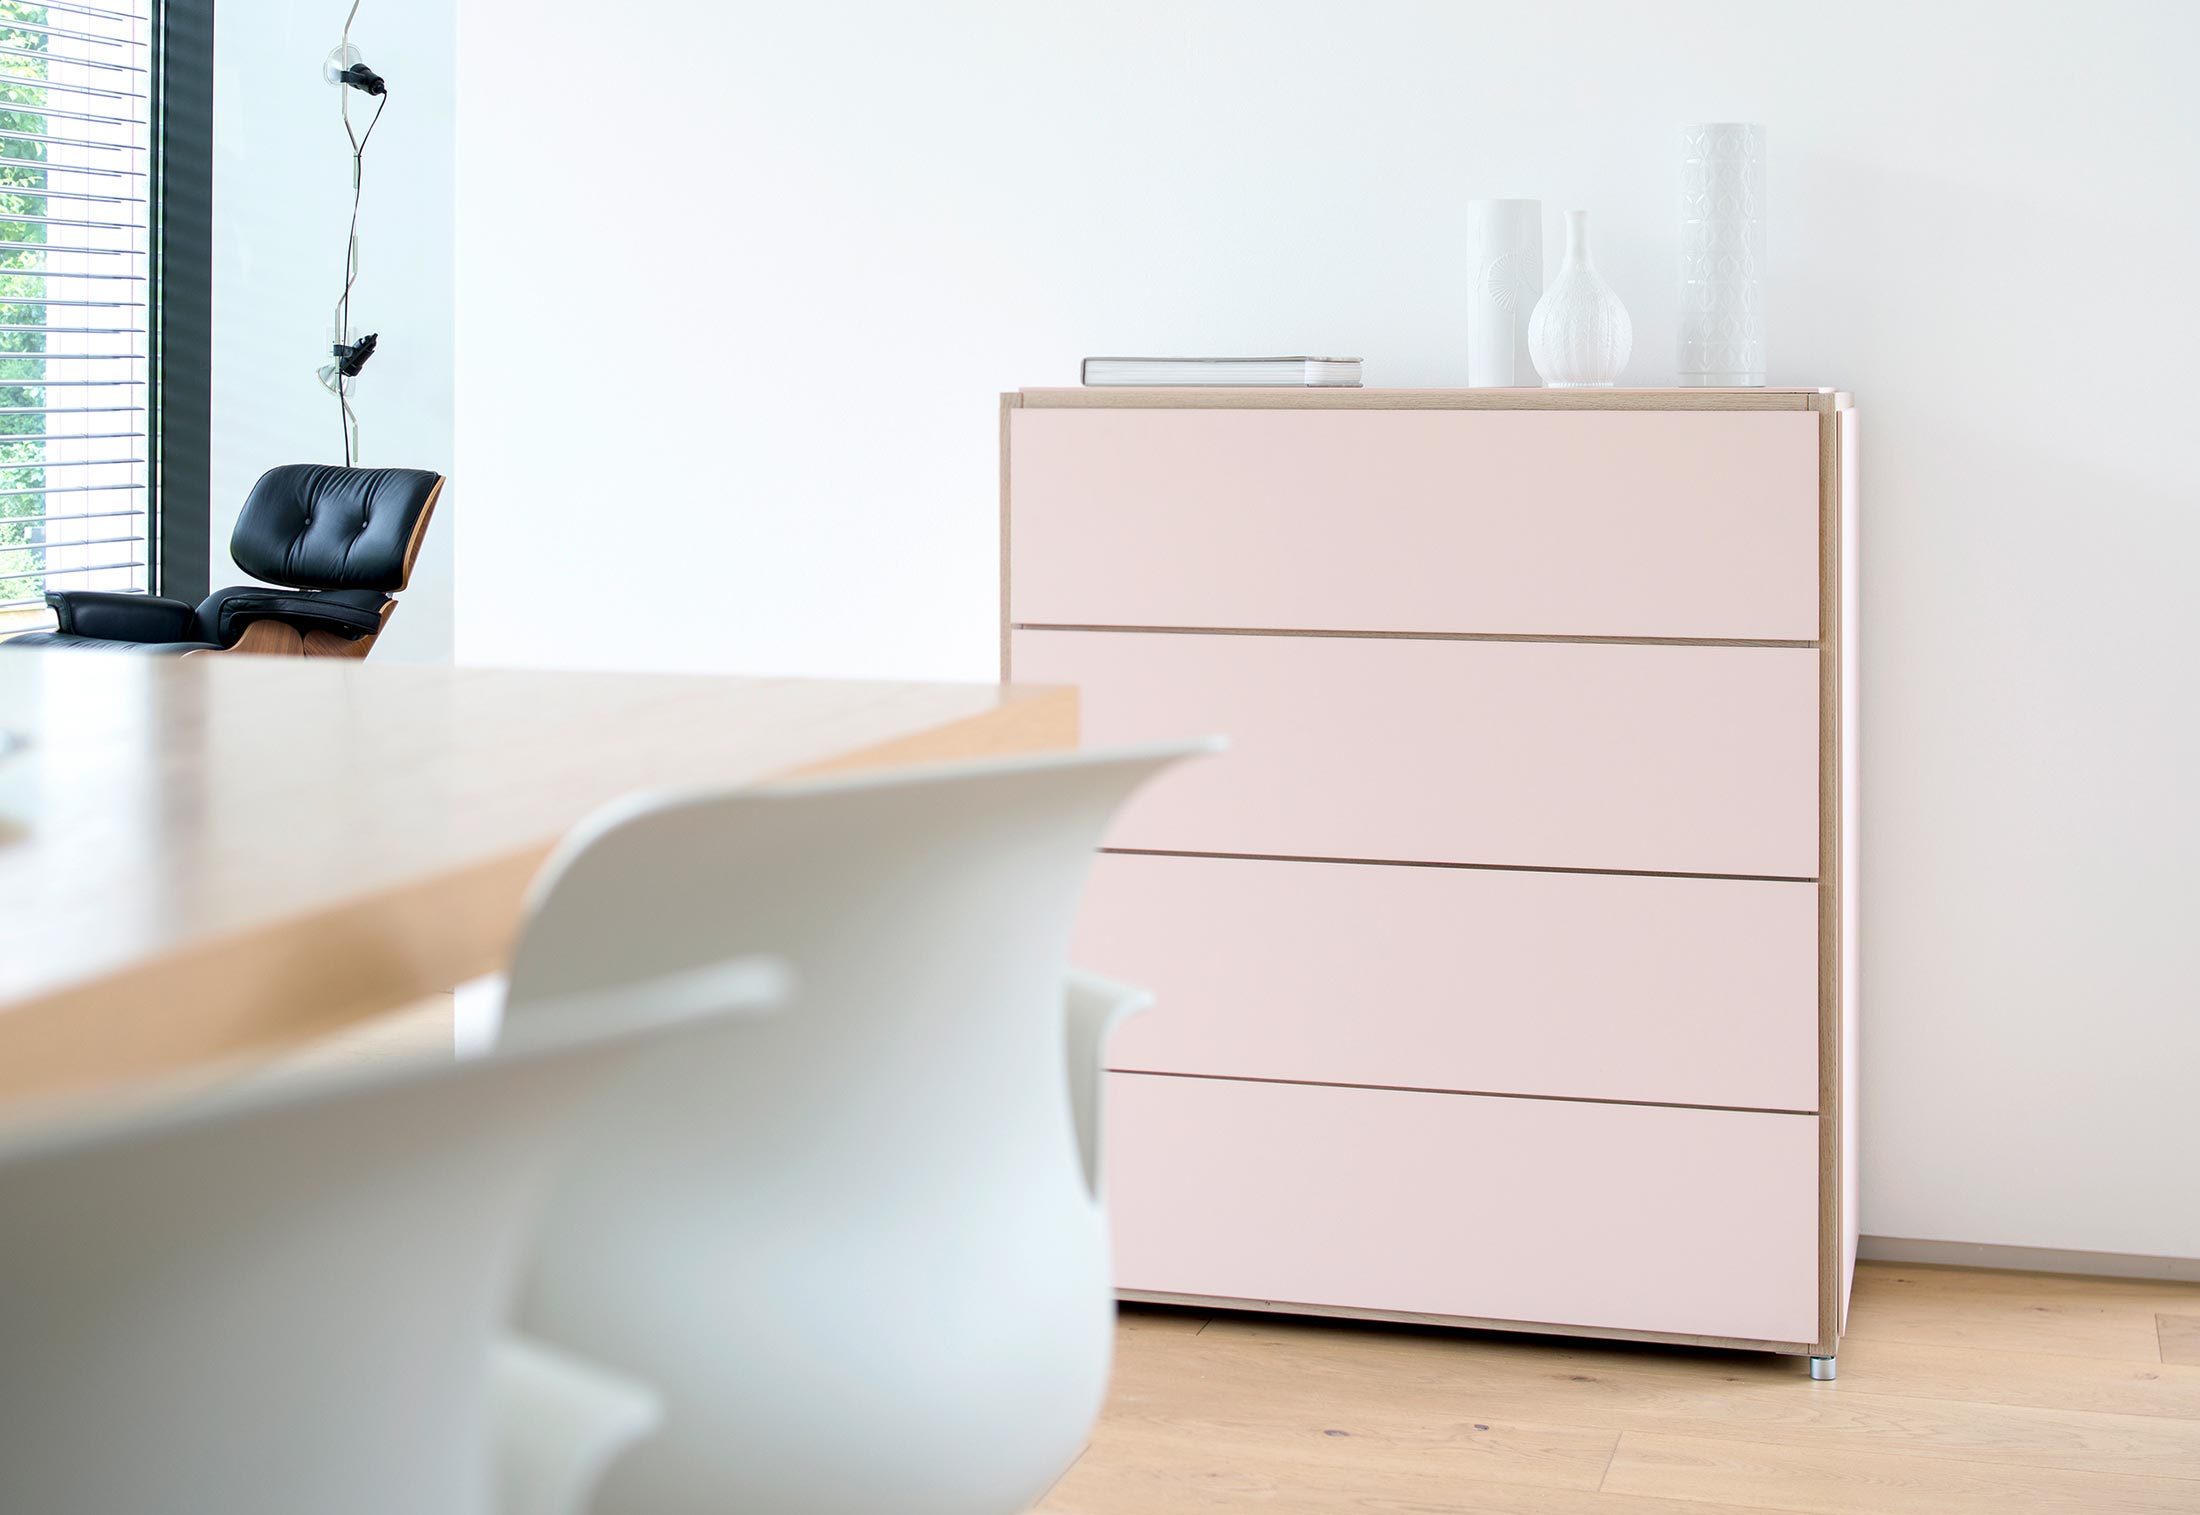 hohe kommode trendy full size of badezimmer tief voice arctic kommode cm breit mit schubladen. Black Bedroom Furniture Sets. Home Design Ideas